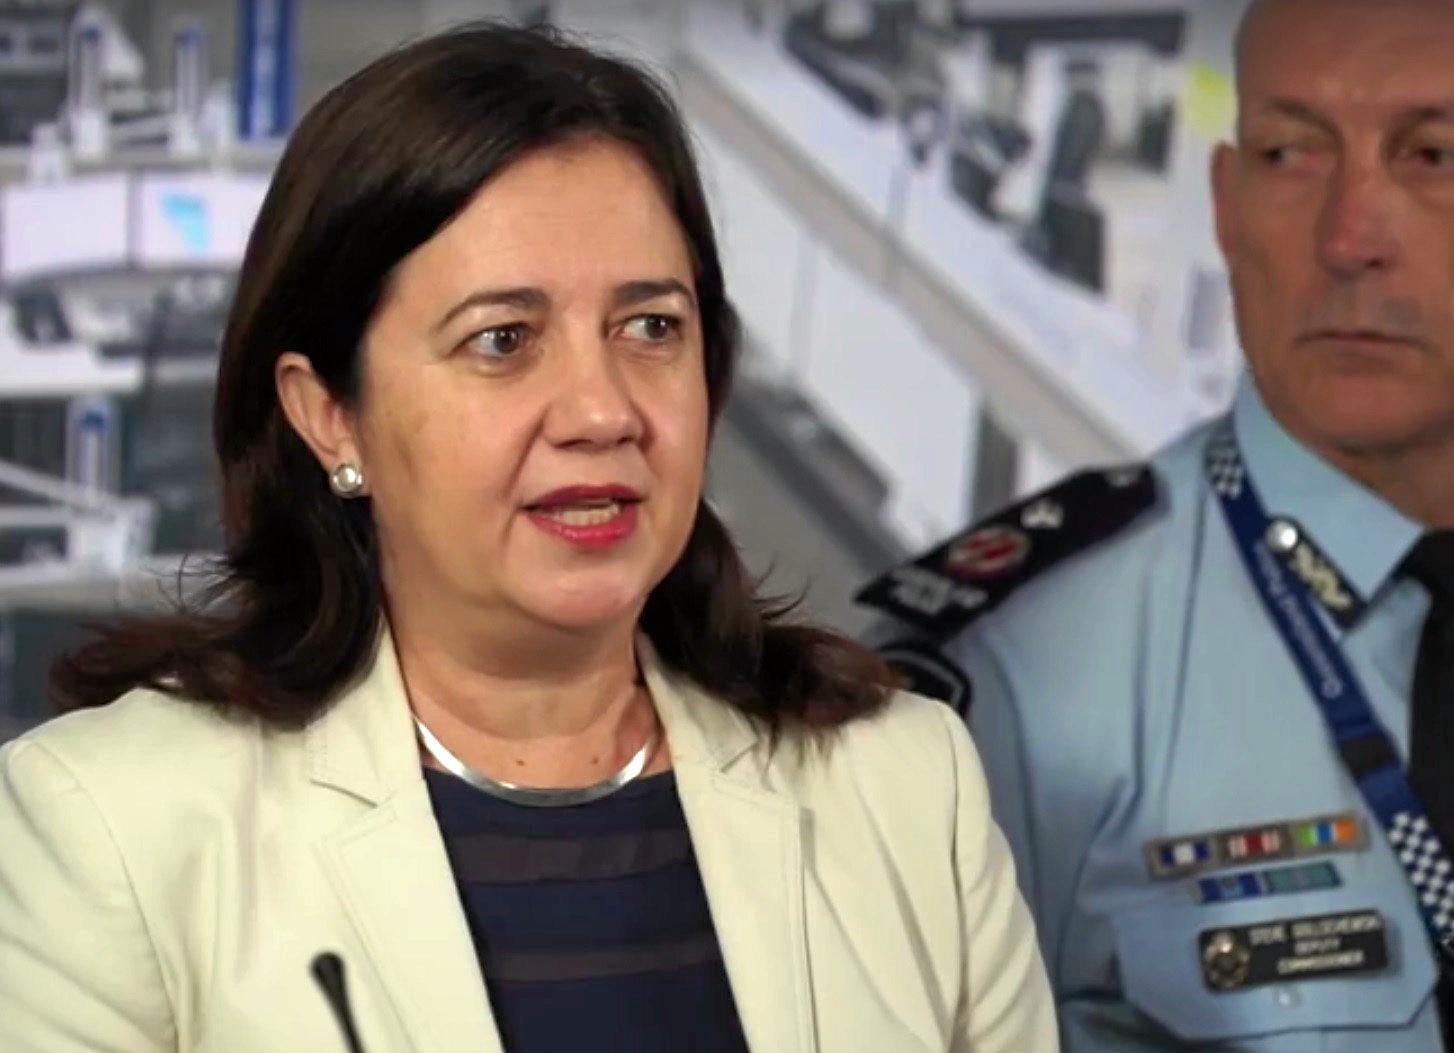 Premier Annastacia Palaszczuk addressed the media regarding Cyclone Debbie.